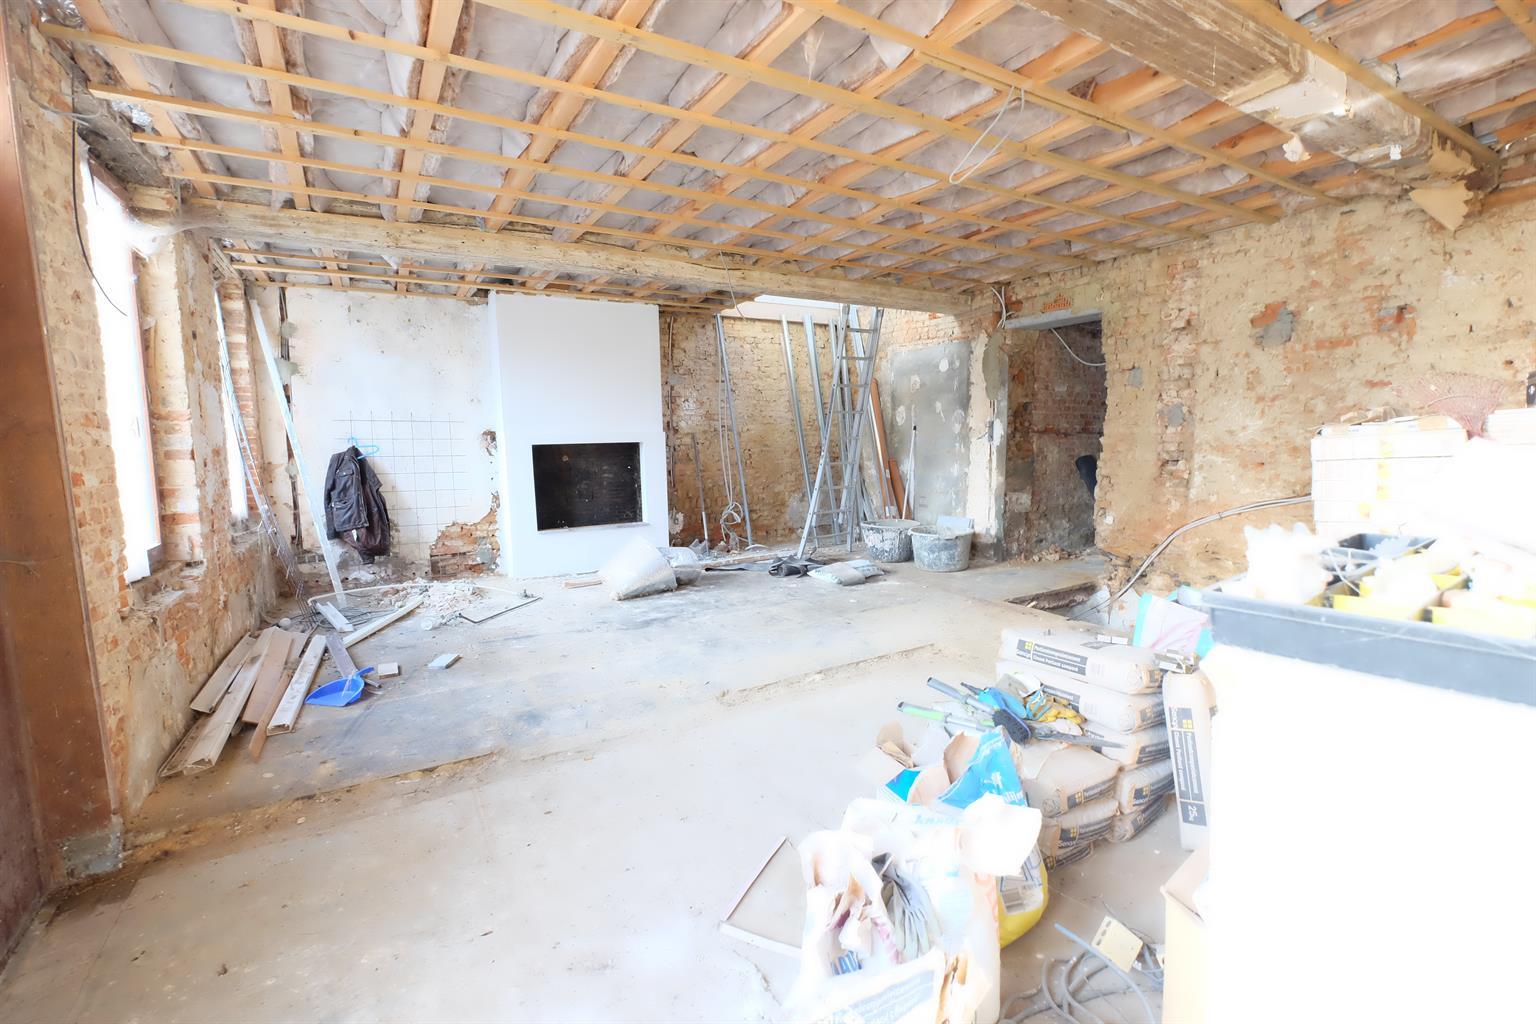 Maison - Tubize Oisquercq - #4500506-1